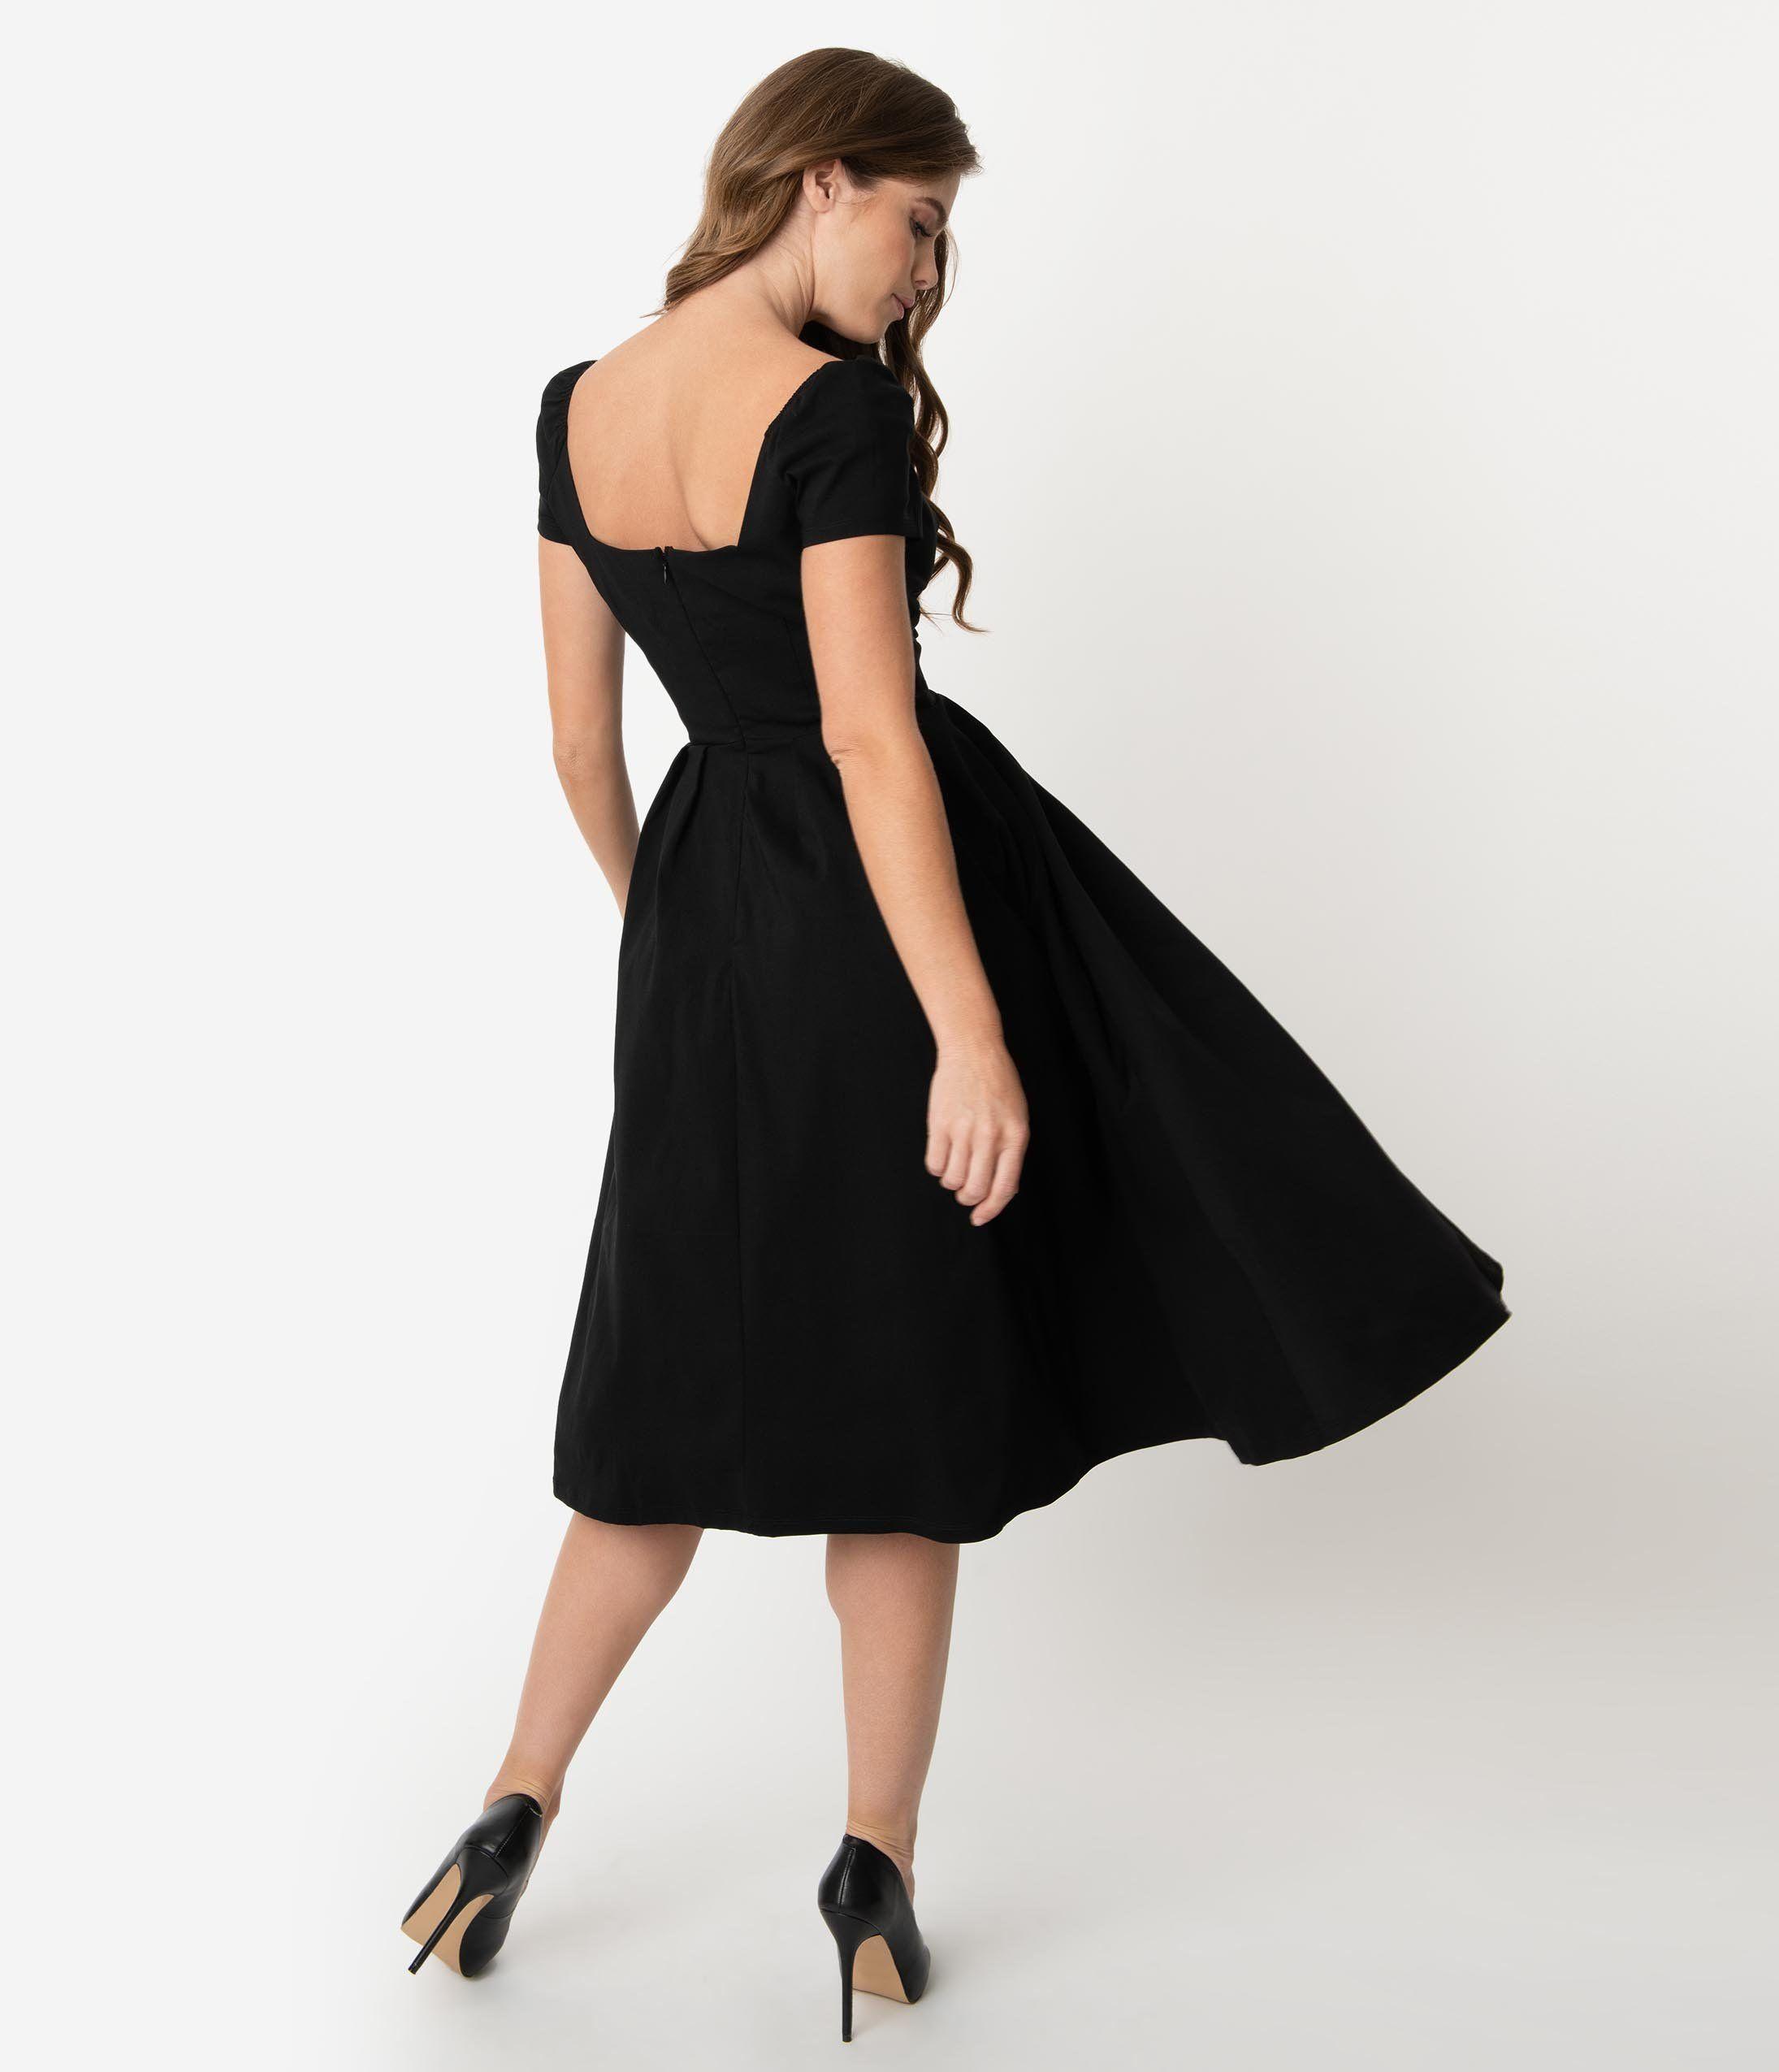 Unique Vintage 1950s Black Sweetheart Midge Swing Dress In 2021 Swing Dress Vintage Dresses Online Vintage Inspired Dresses [ 2550 x 2190 Pixel ]